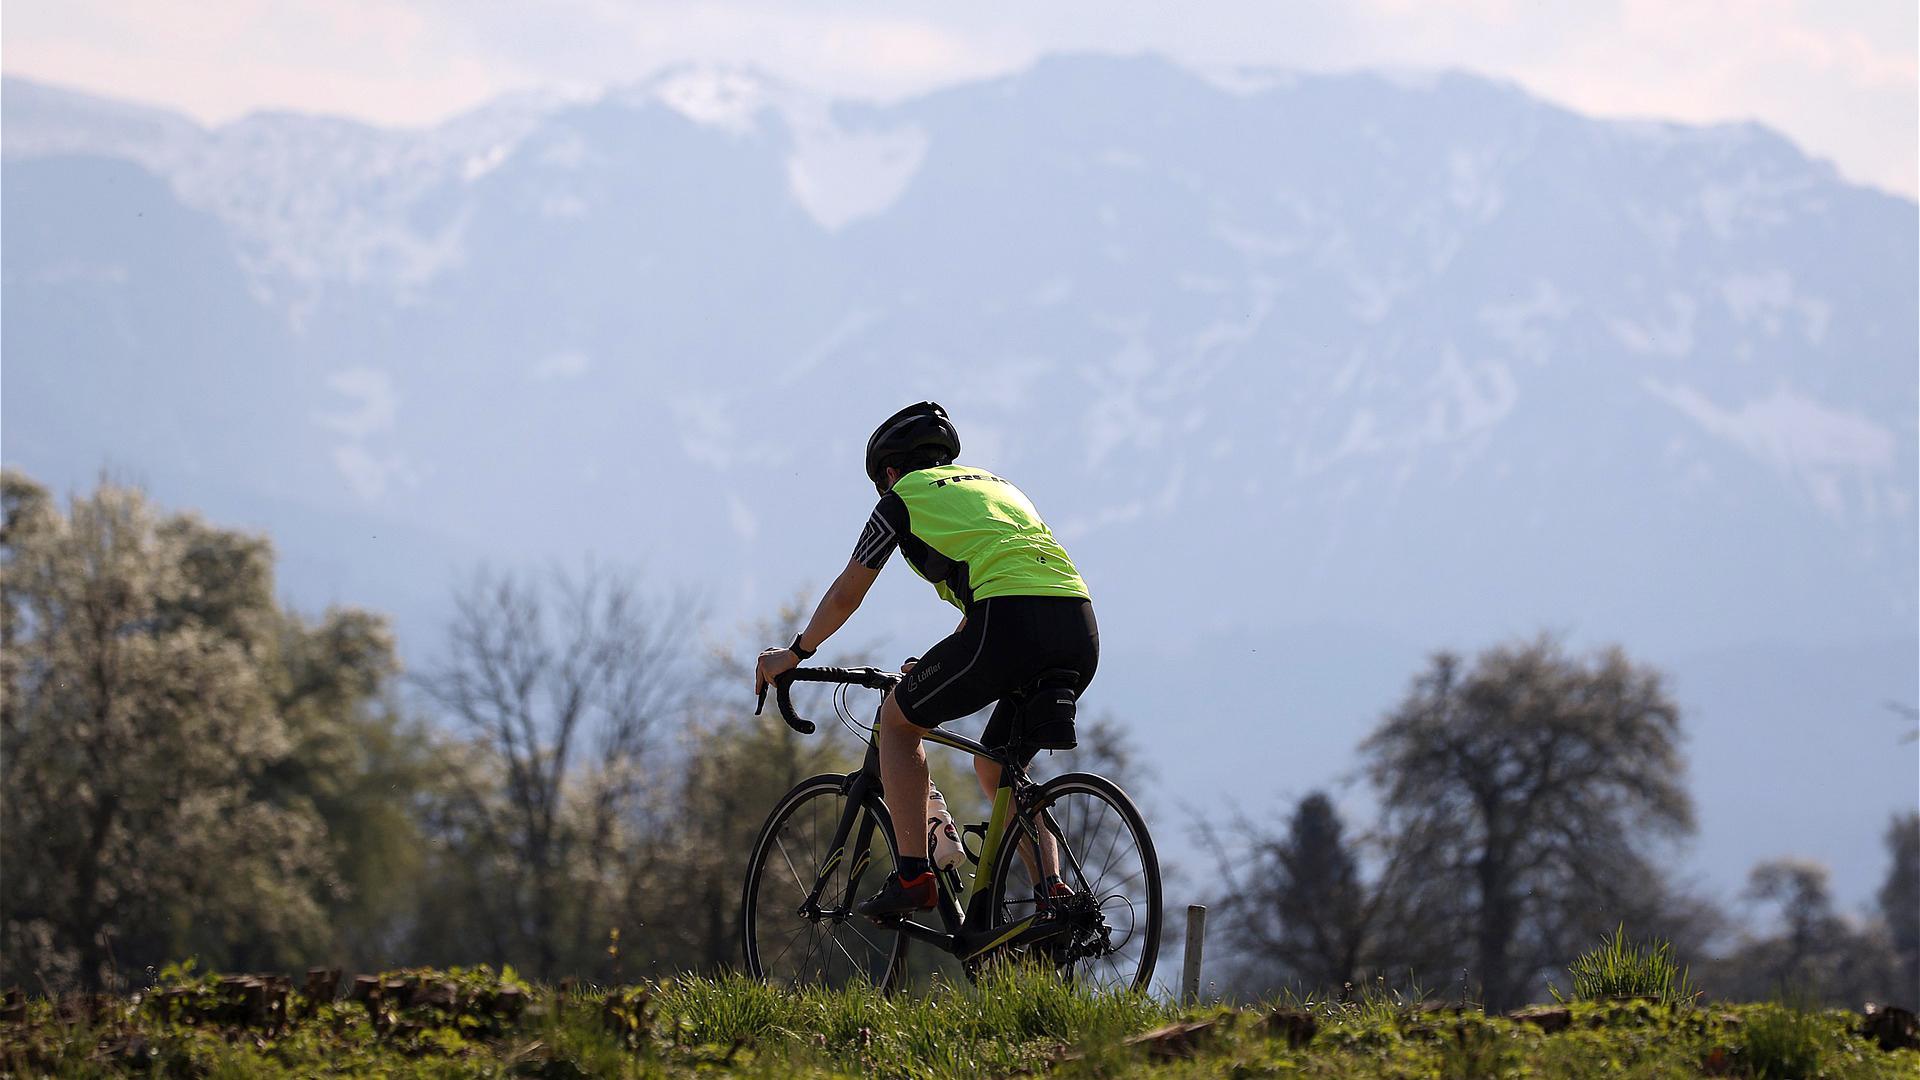 Gravel biking across the Velebit mountain